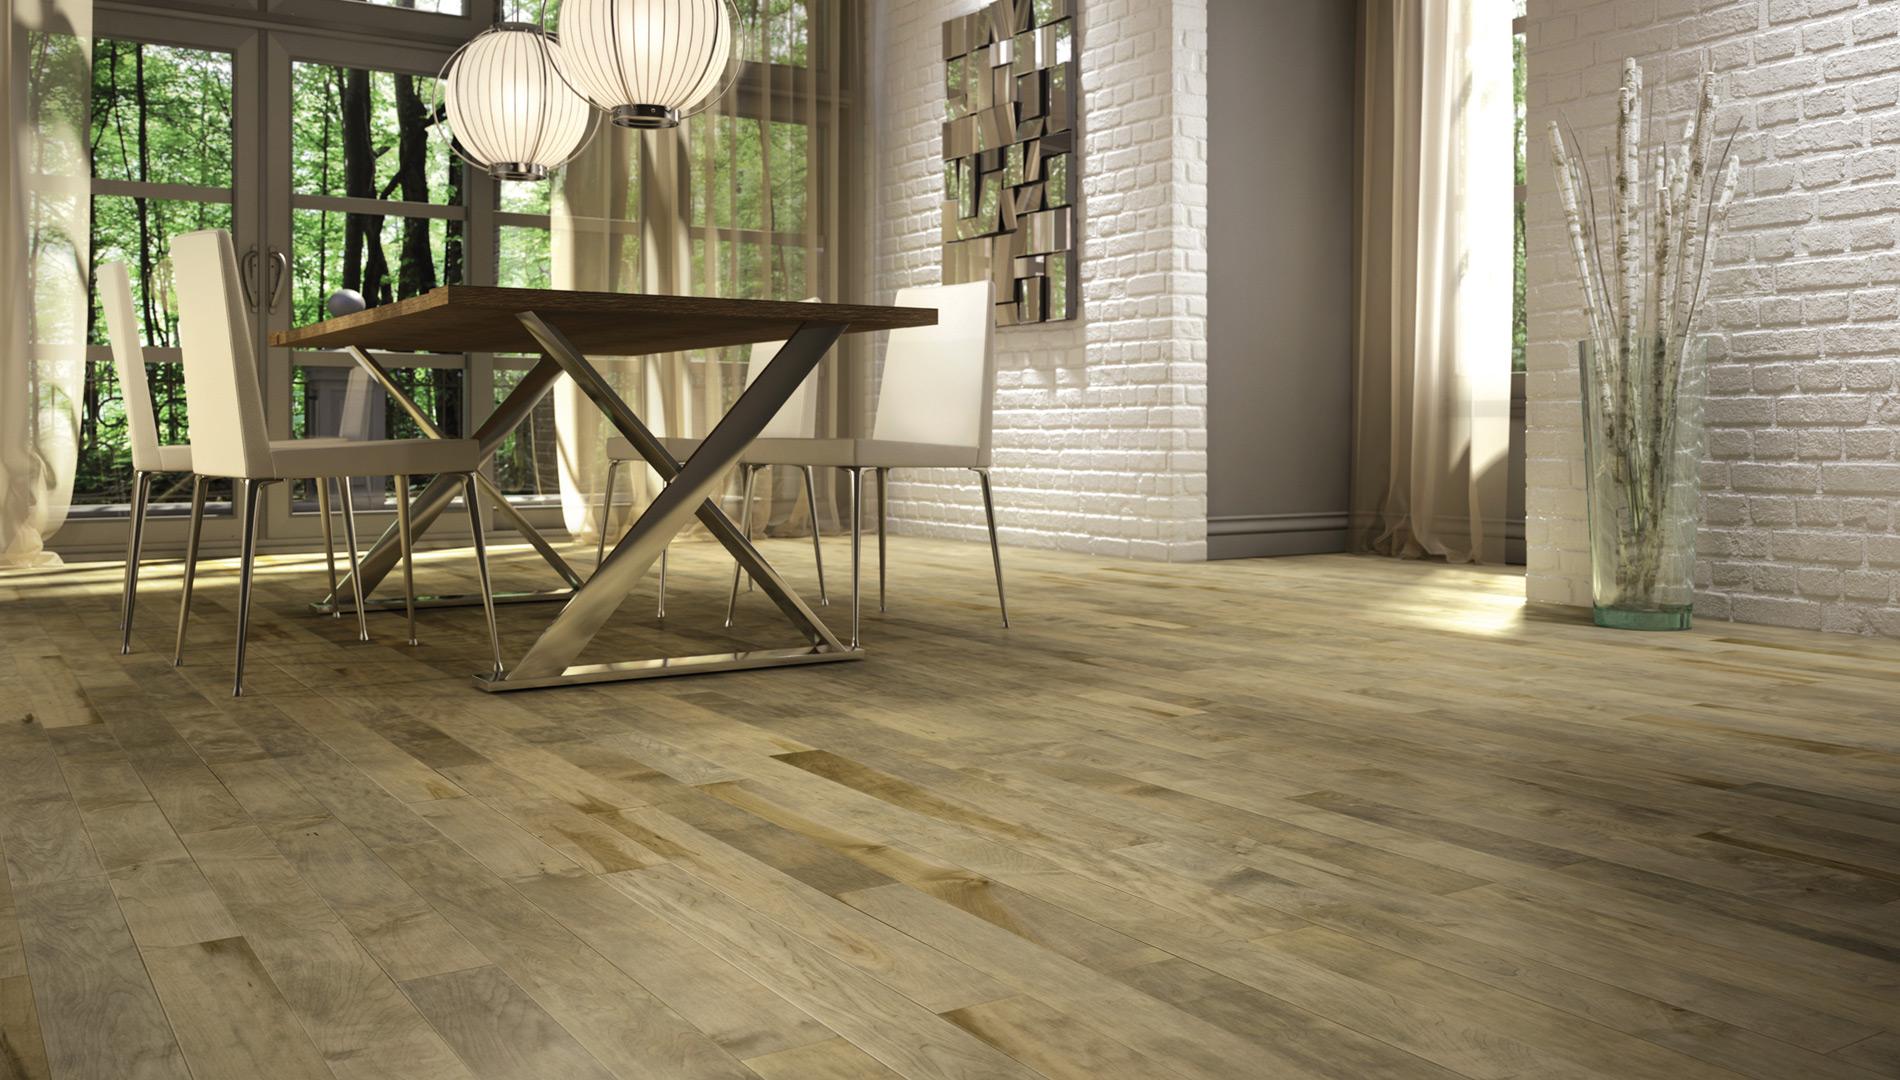 Lauzon Distinctive Hardwood Flooring A